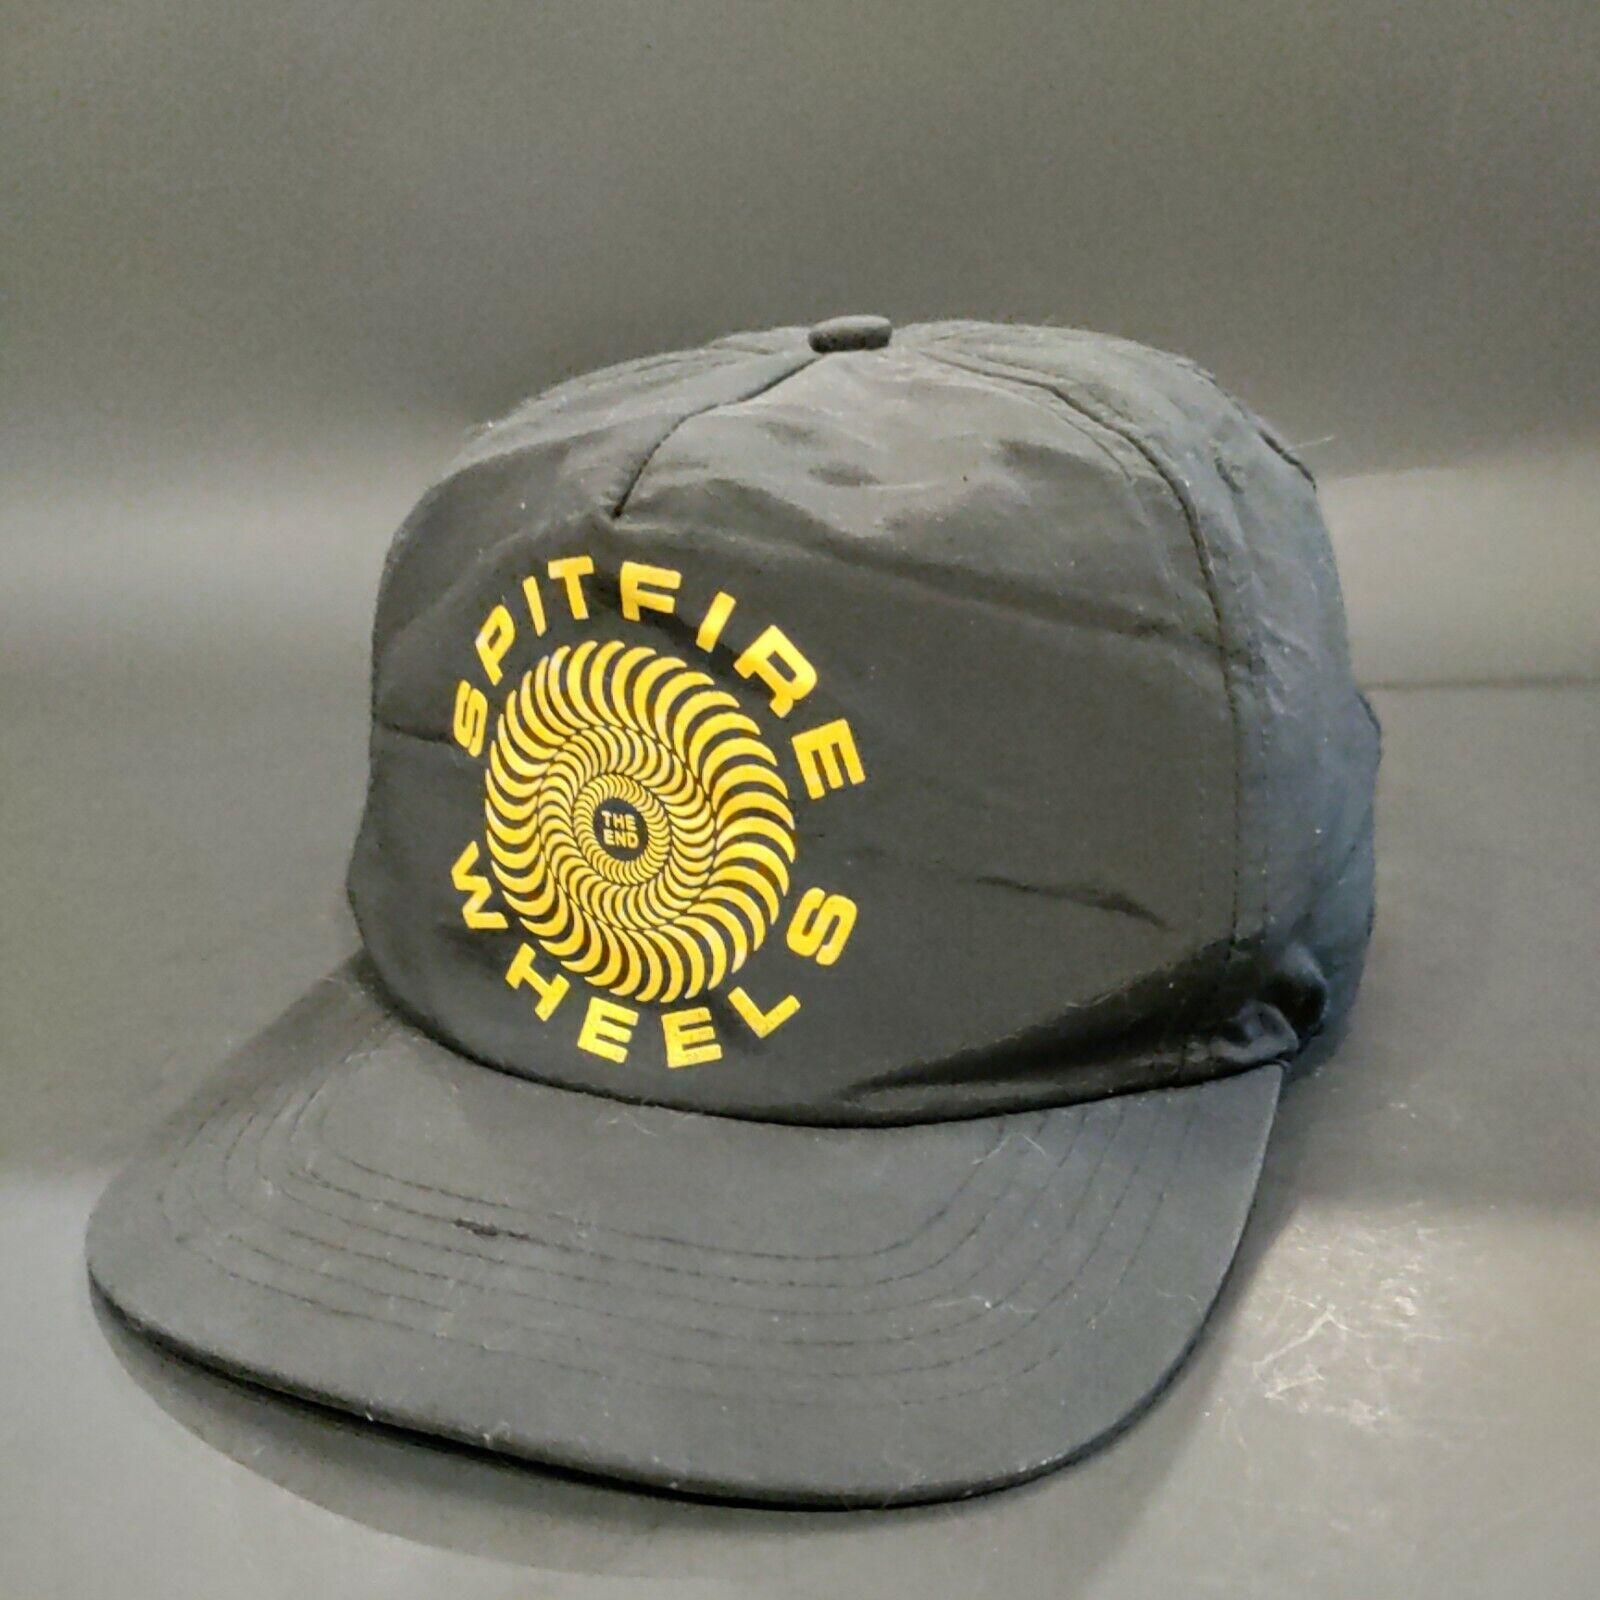 VTG 90s SPITFIRE Wheels Skater Thrash Punk Black Nylon Snapback Hat Cap